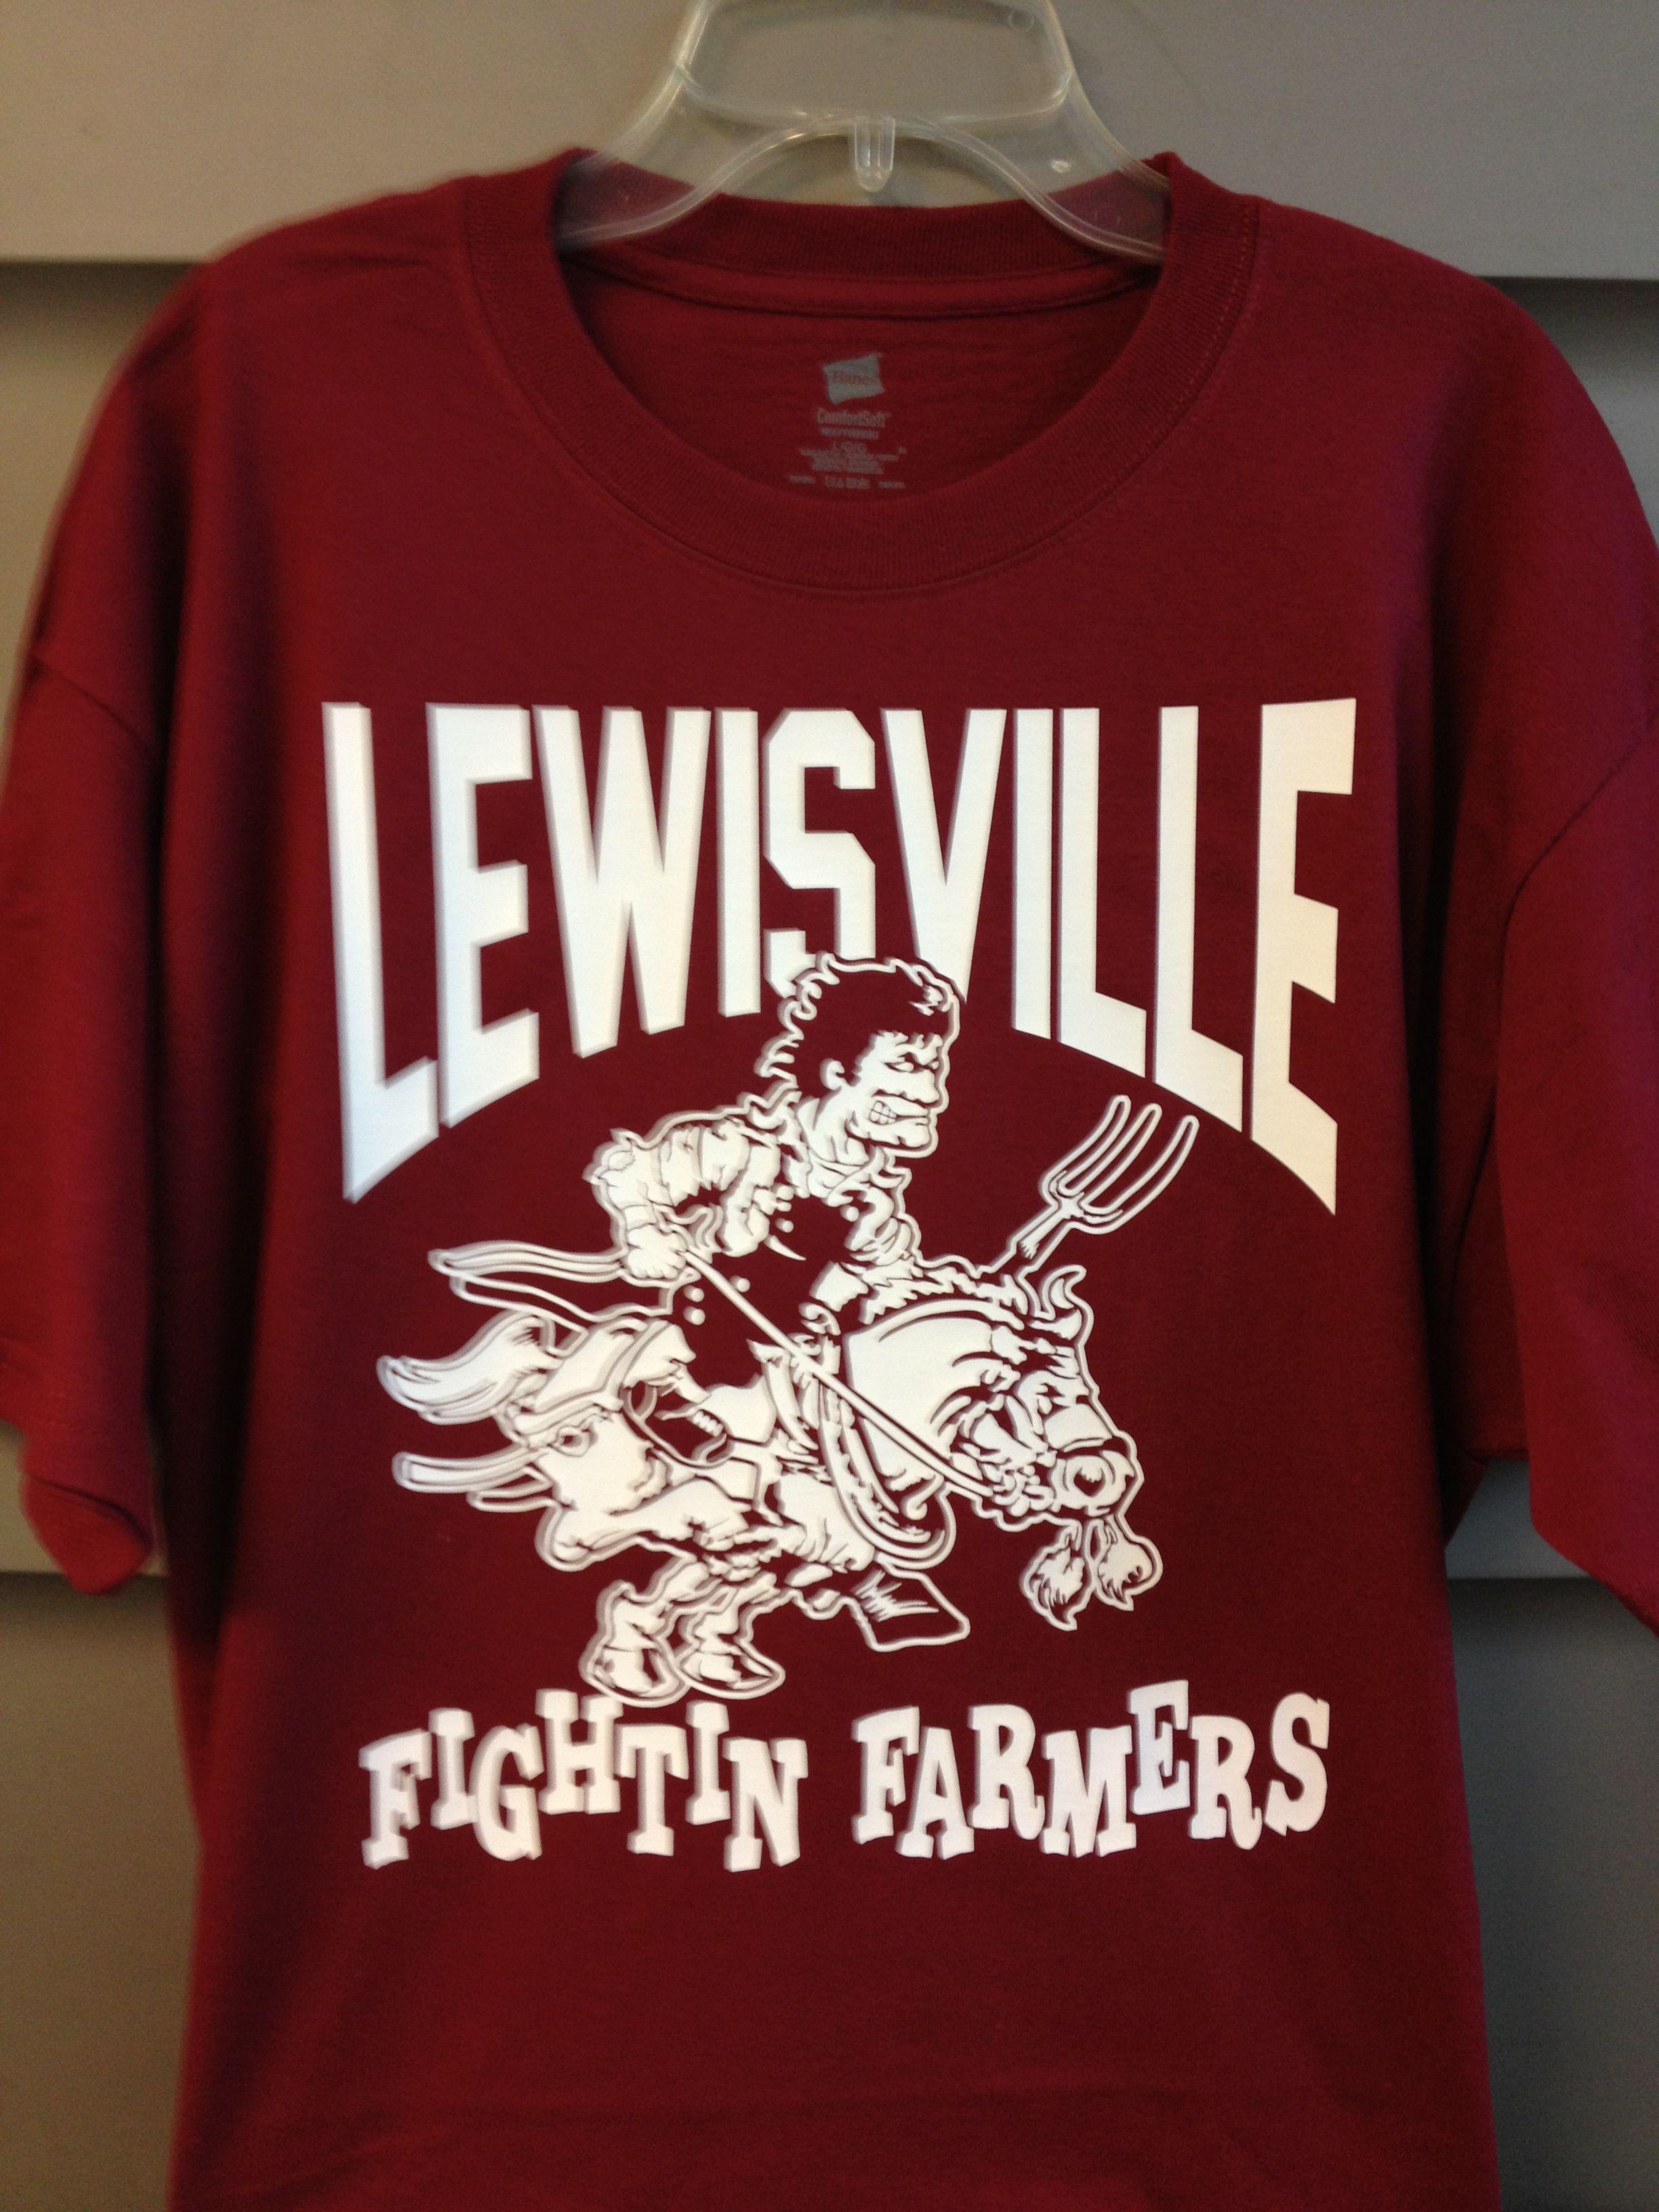 Lewisville Fightin Farmers TShirts